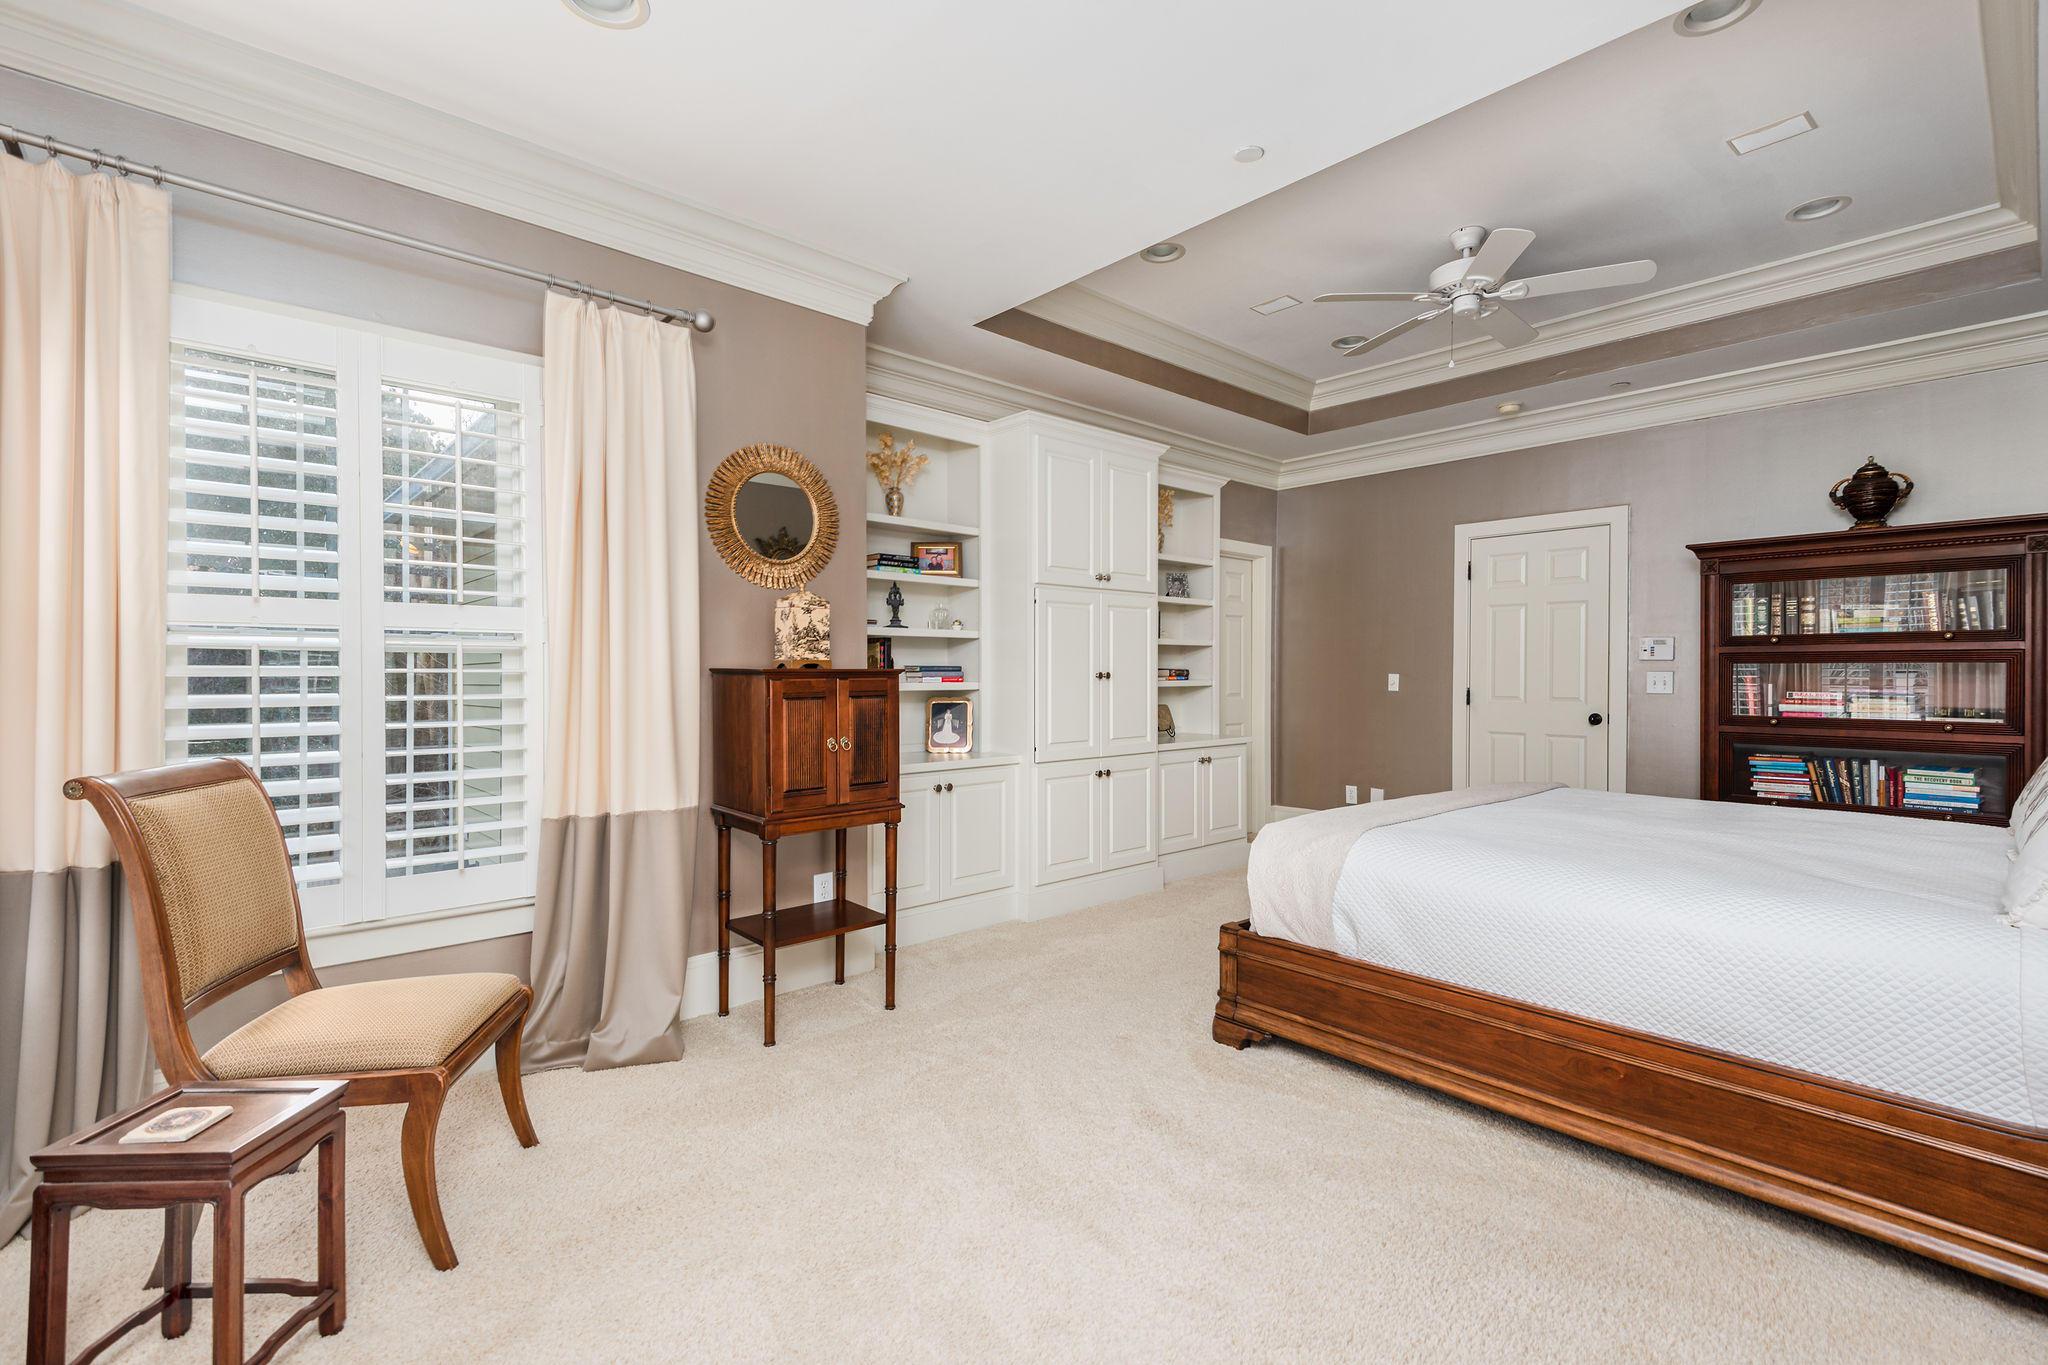 Dunes West Homes For Sale - 1305 King Bird, Mount Pleasant, SC - 28